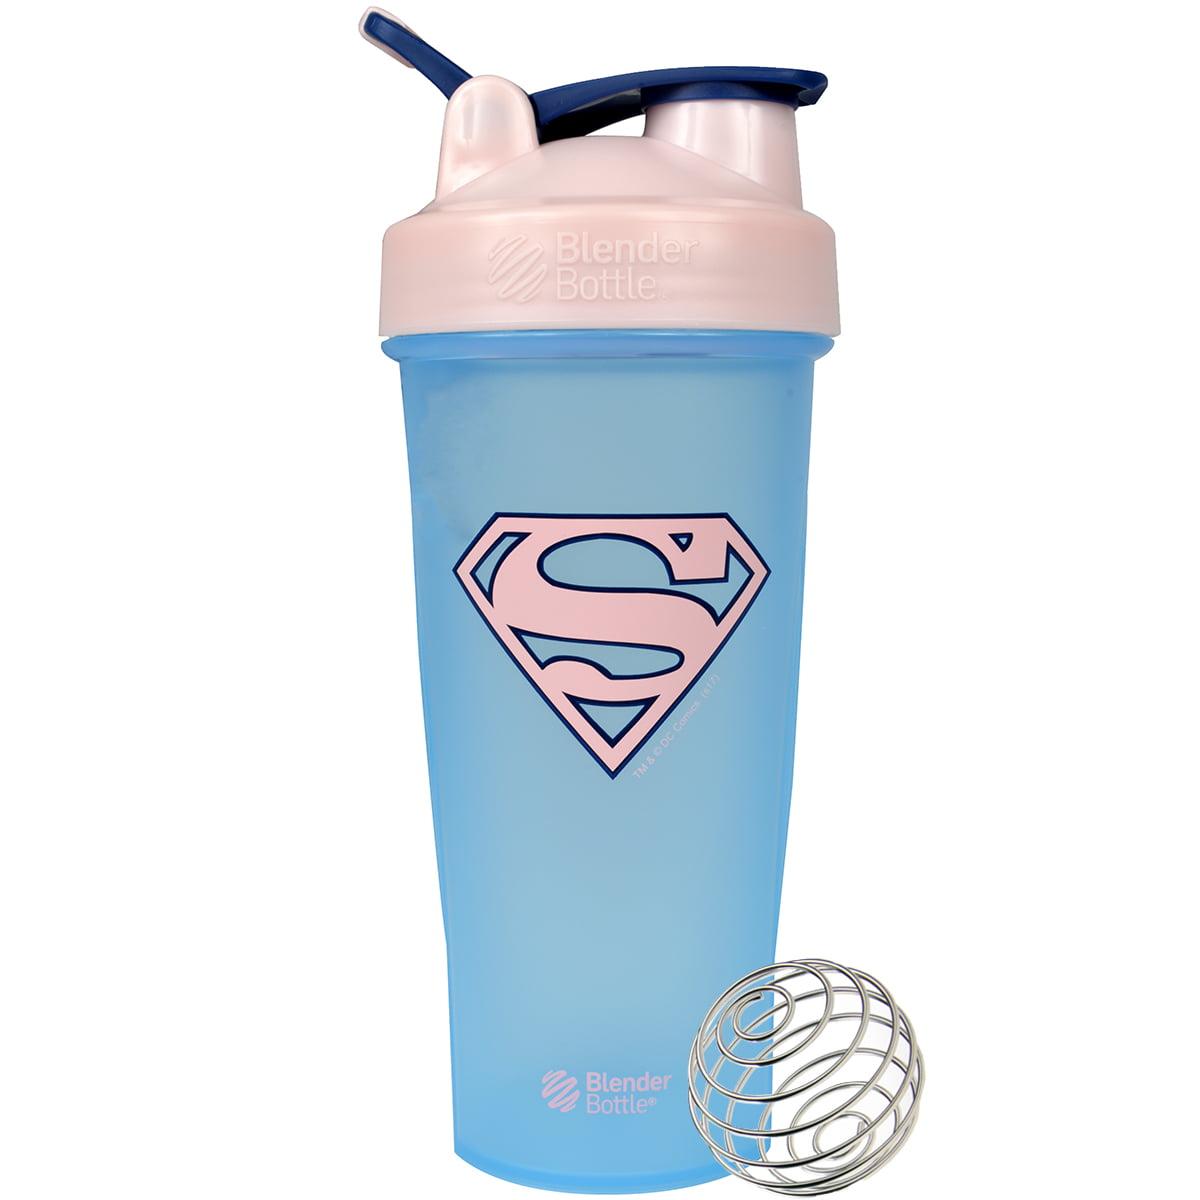 Blender Bottle DC Comics Superhero Series 28 oz. Classic Shaker with Loop Top